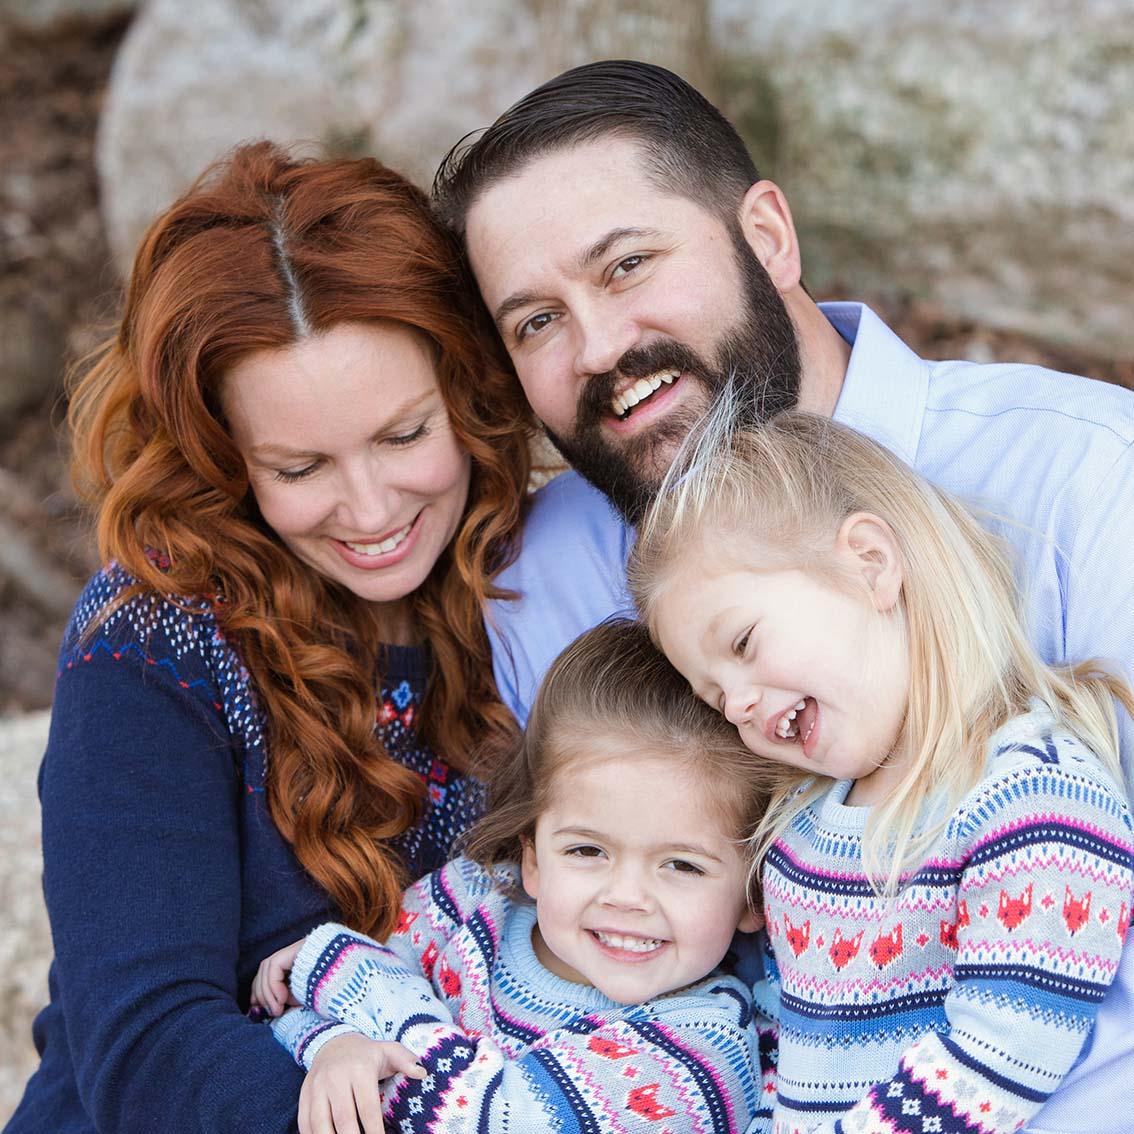 Austin family photographer Bull Creek Austin family of four laughing